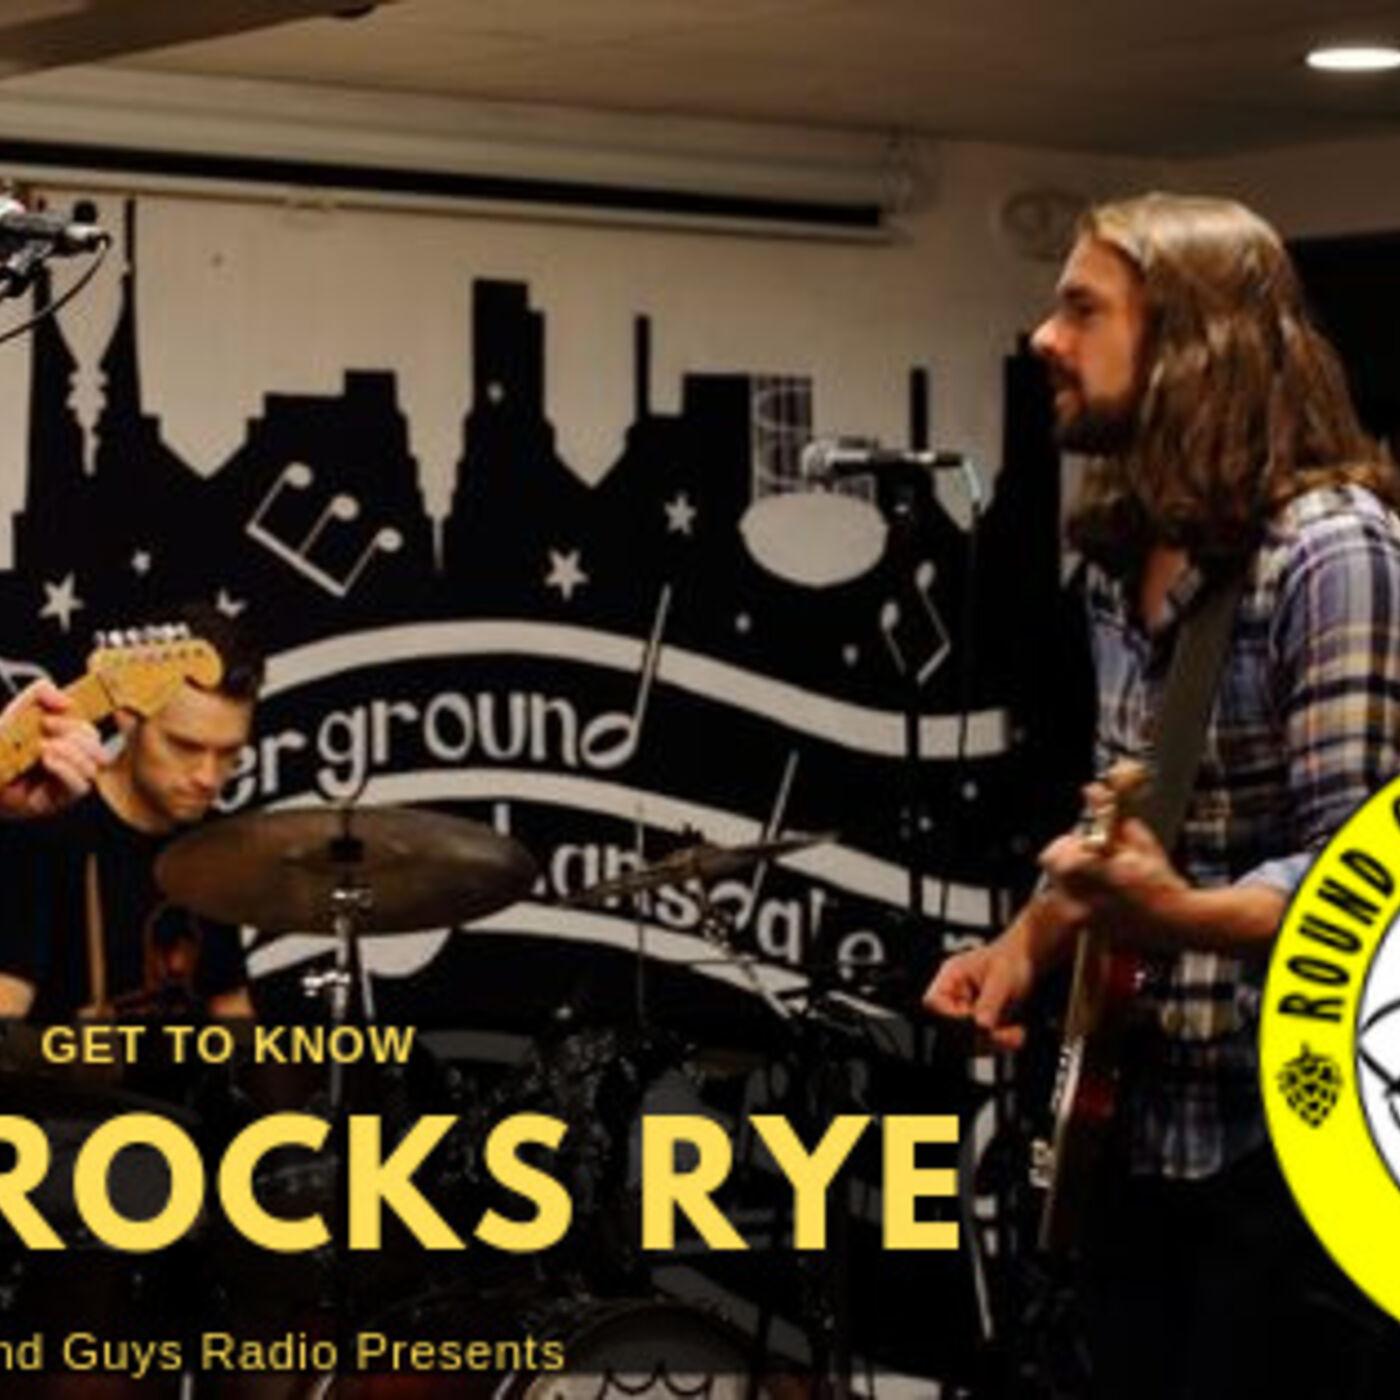 [Bonus] Take a Listen to Two Rocks Rye perform Telejam